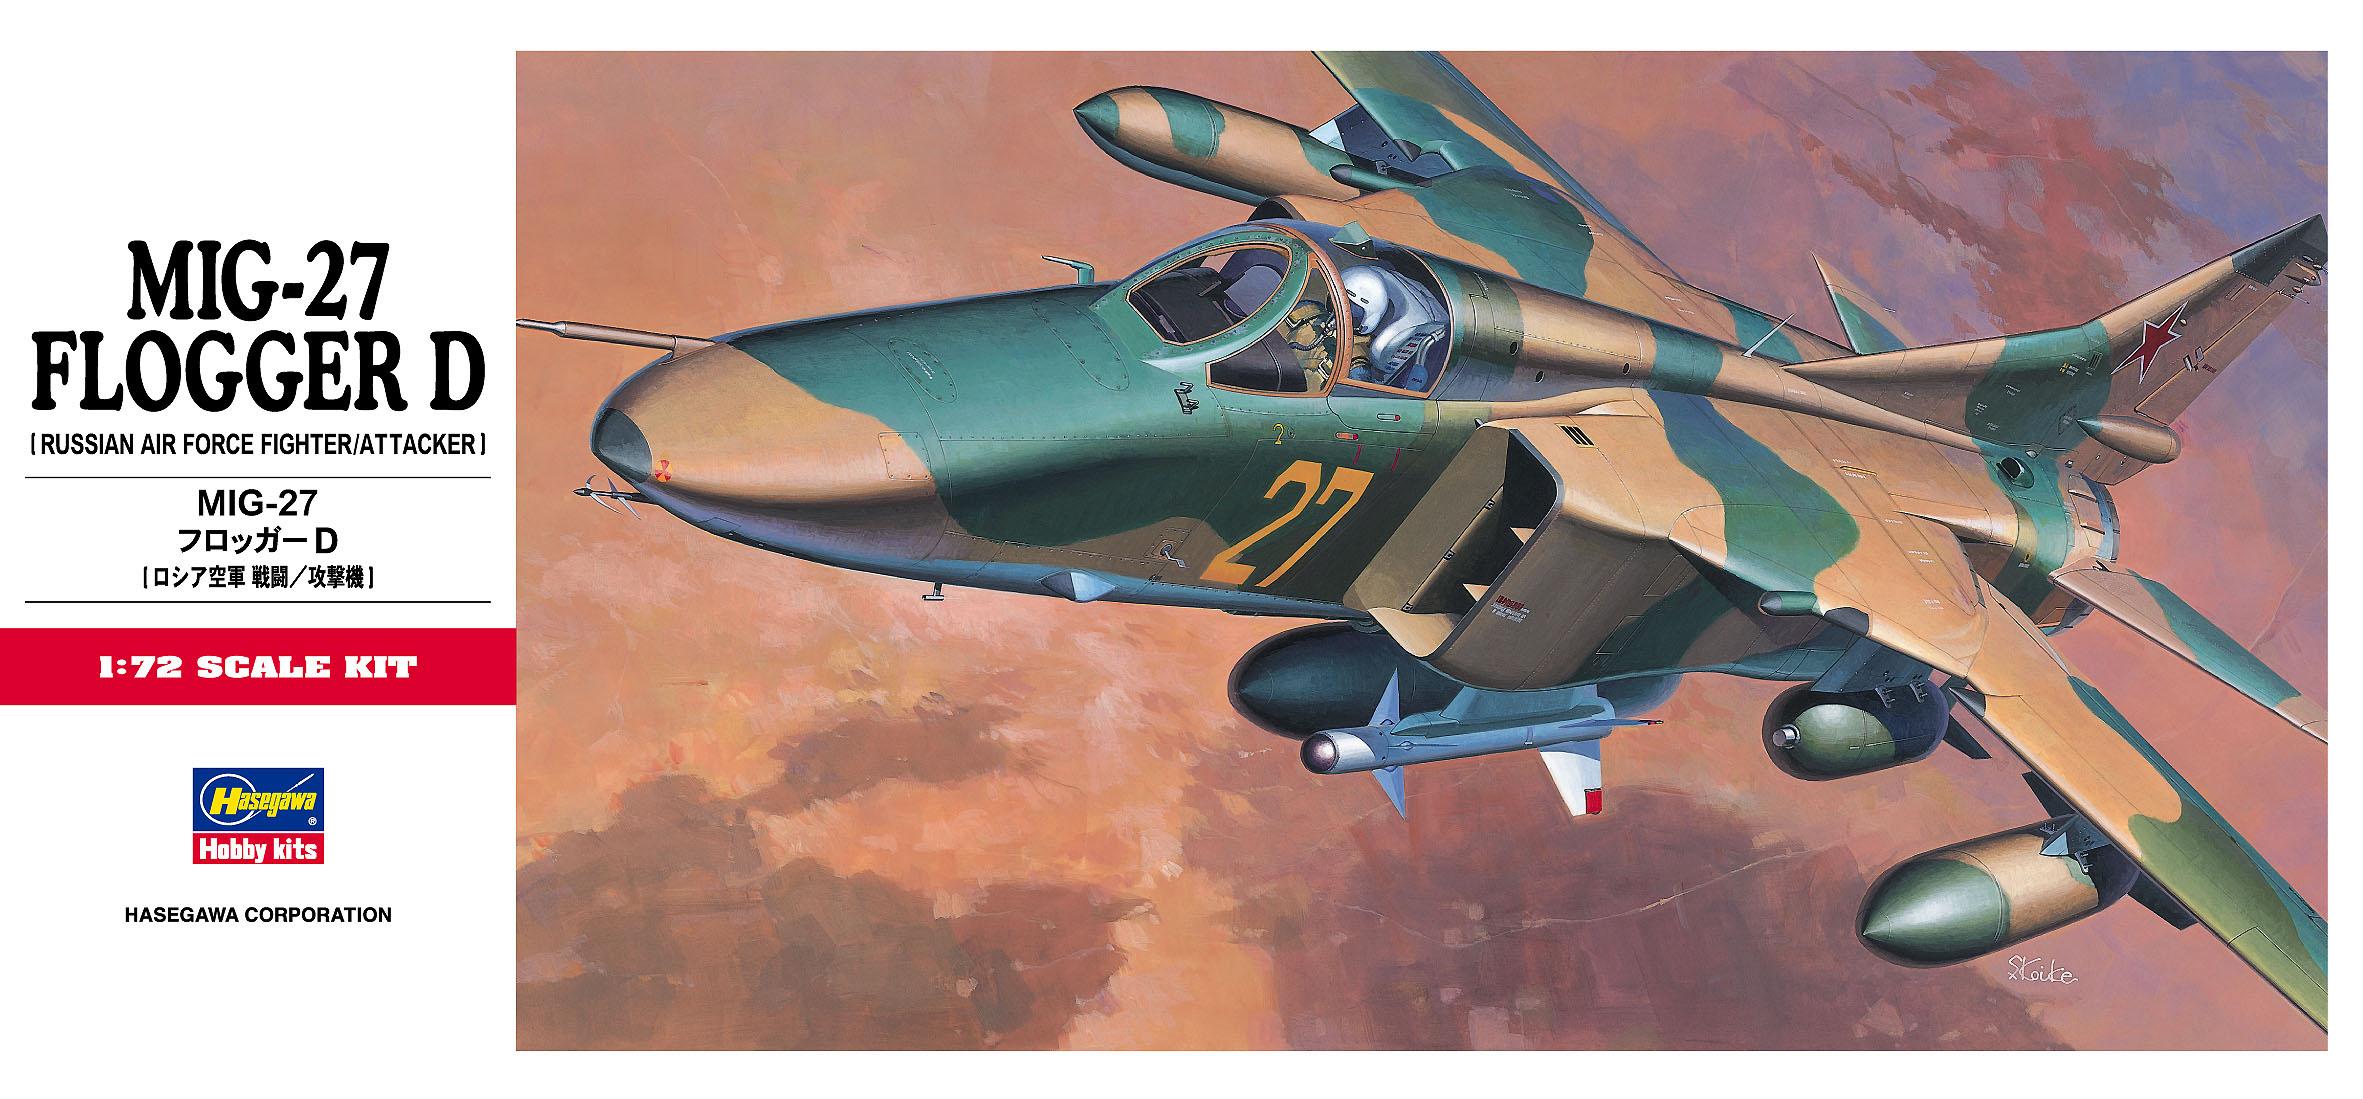 Hasegawa Mikoyan-27 Flogger D